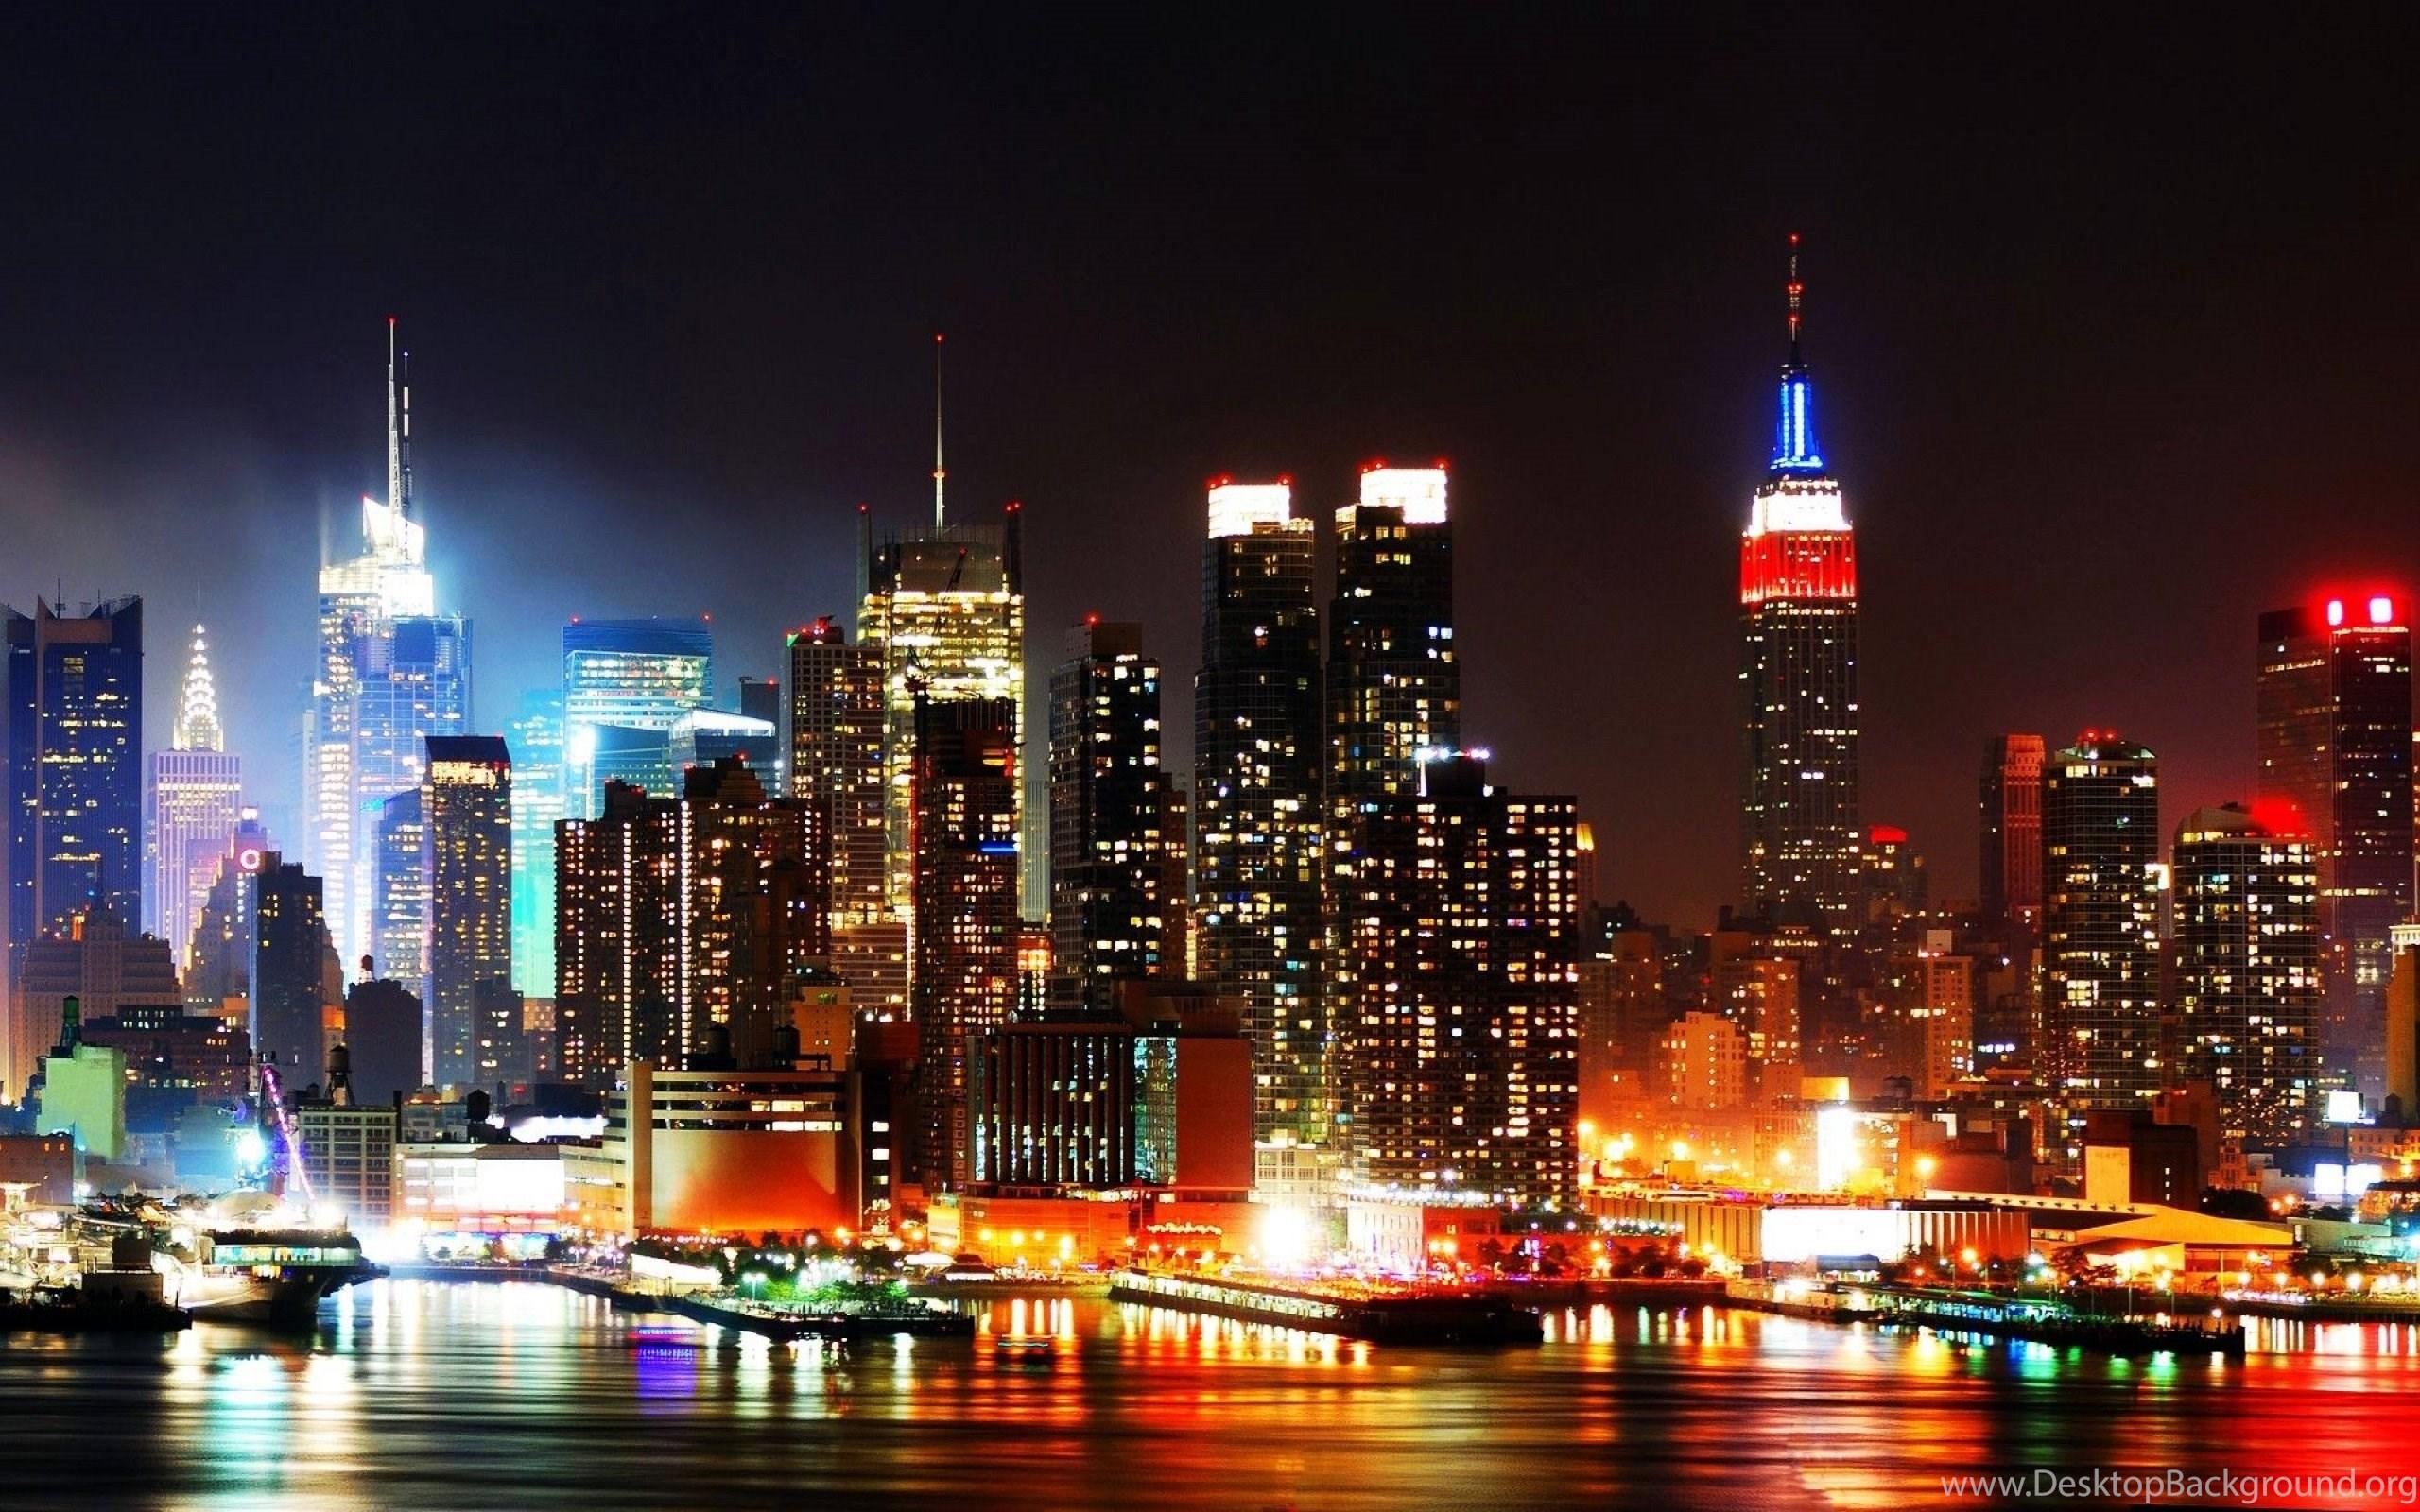 Amazing Wallpaper High Resolution City - 778194_high-resolution-new-york-skyline-at-night-wallpapers-hd-21-city_2560x1600_h  2018_64145.jpg